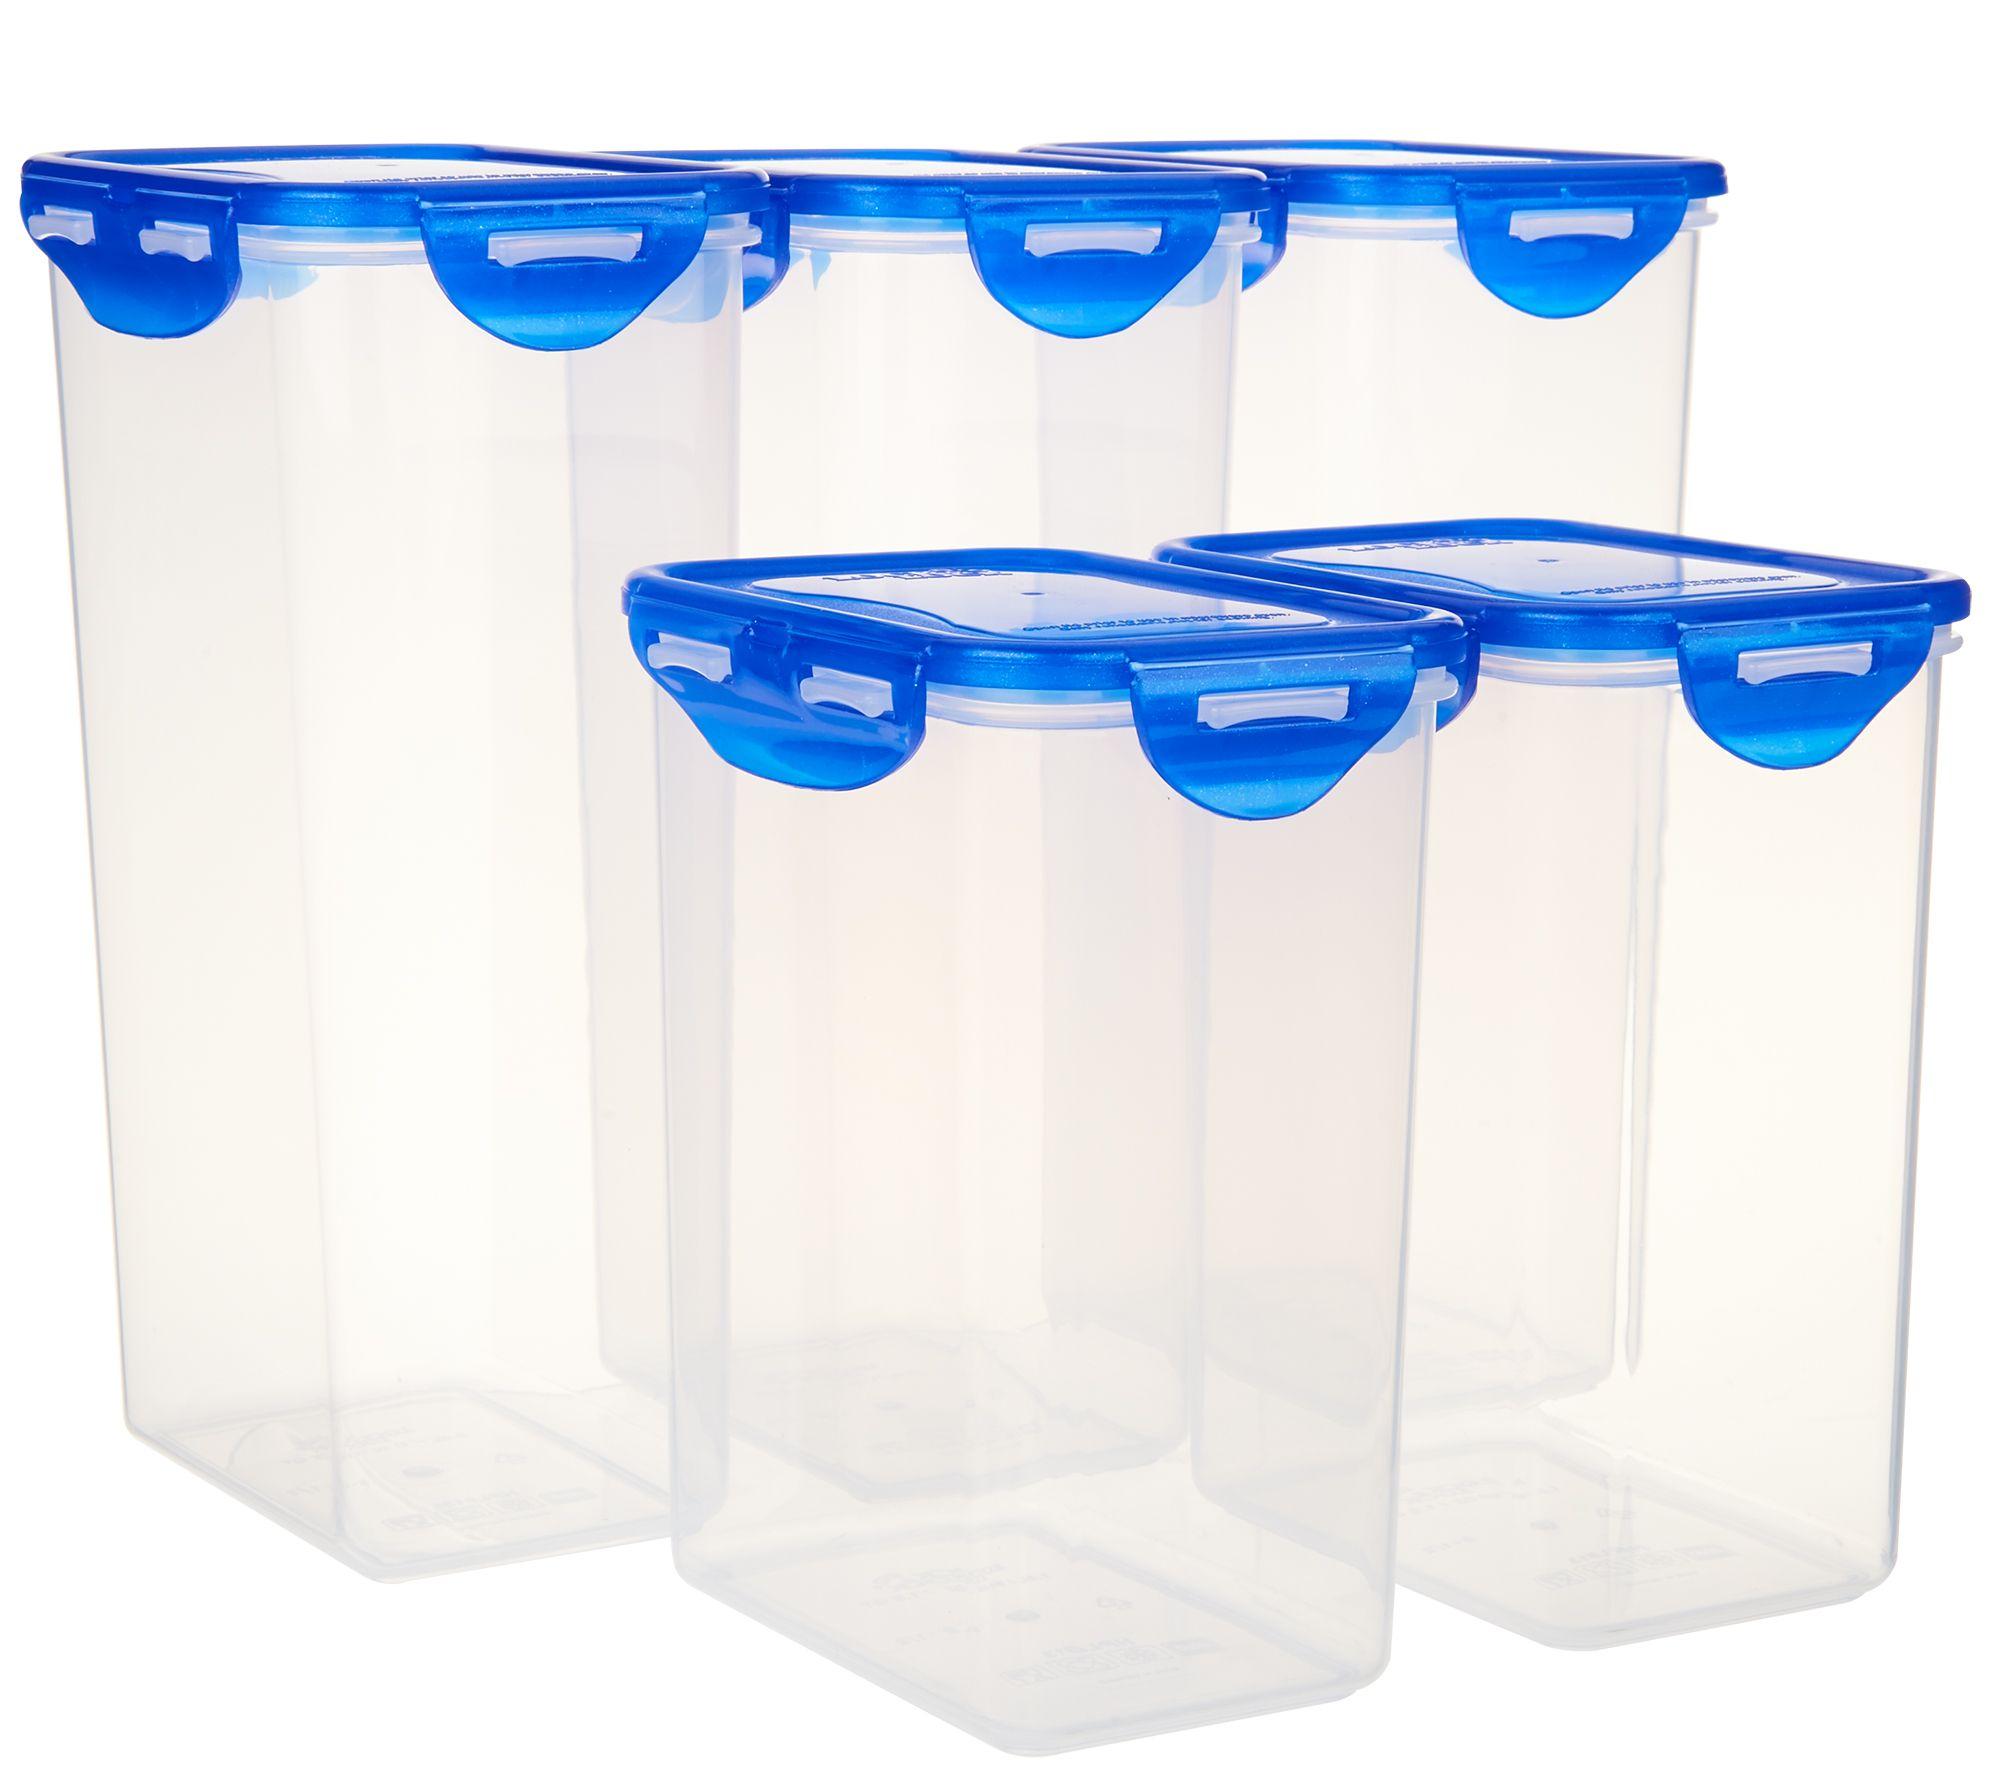 Pantry Cabinet With Lock: Lock & Lock 5-piece Pantry Set